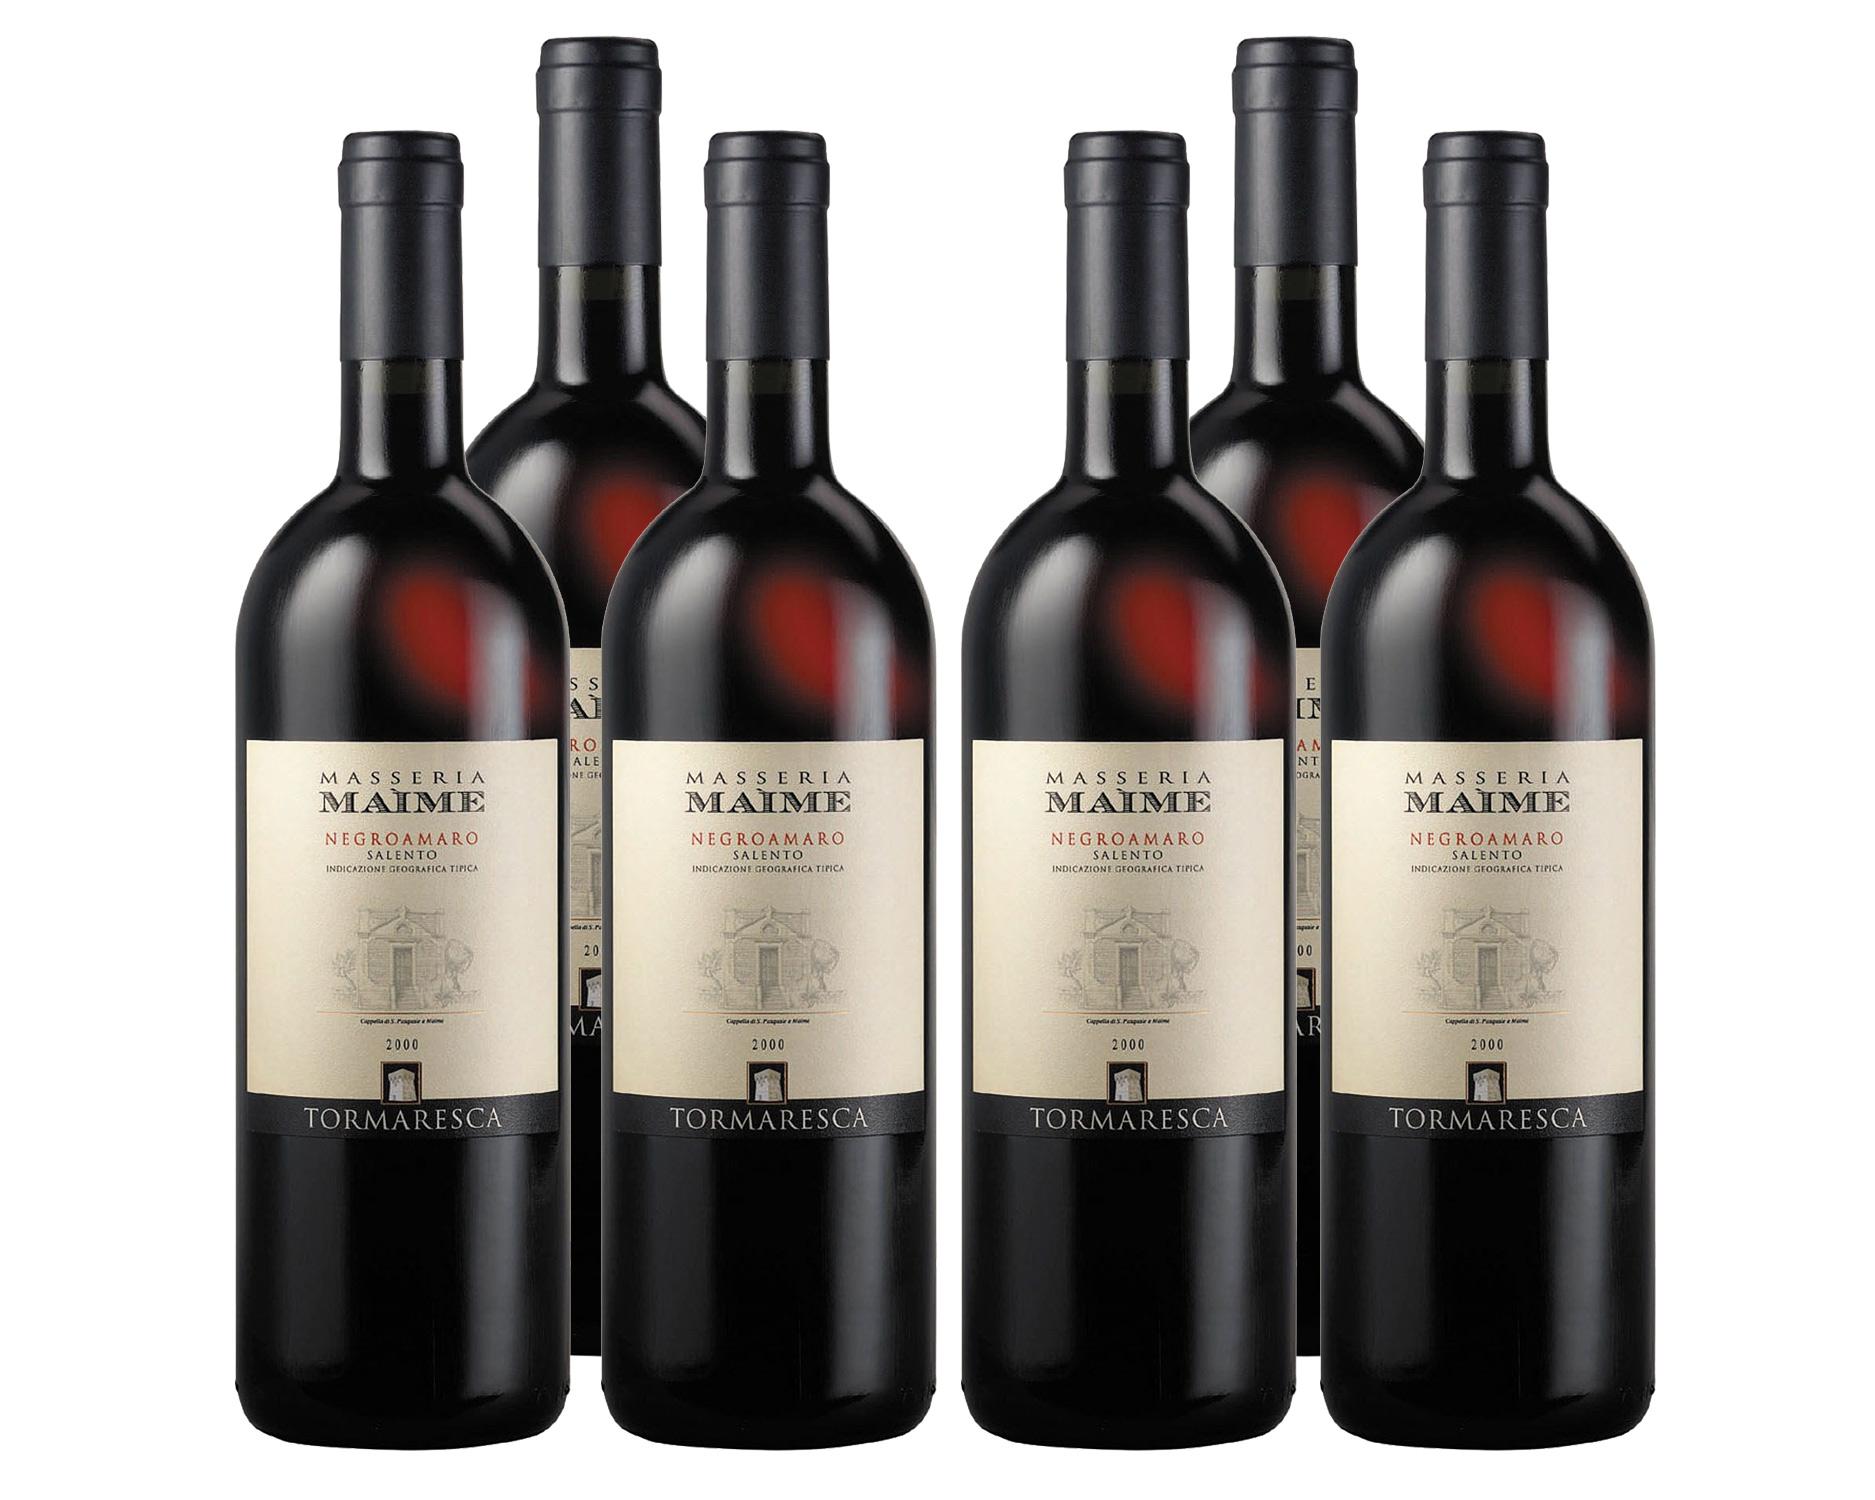 Tormaresca Masseria Maime Negroamaro Salento 2010 (Paket/6 Flaschen)